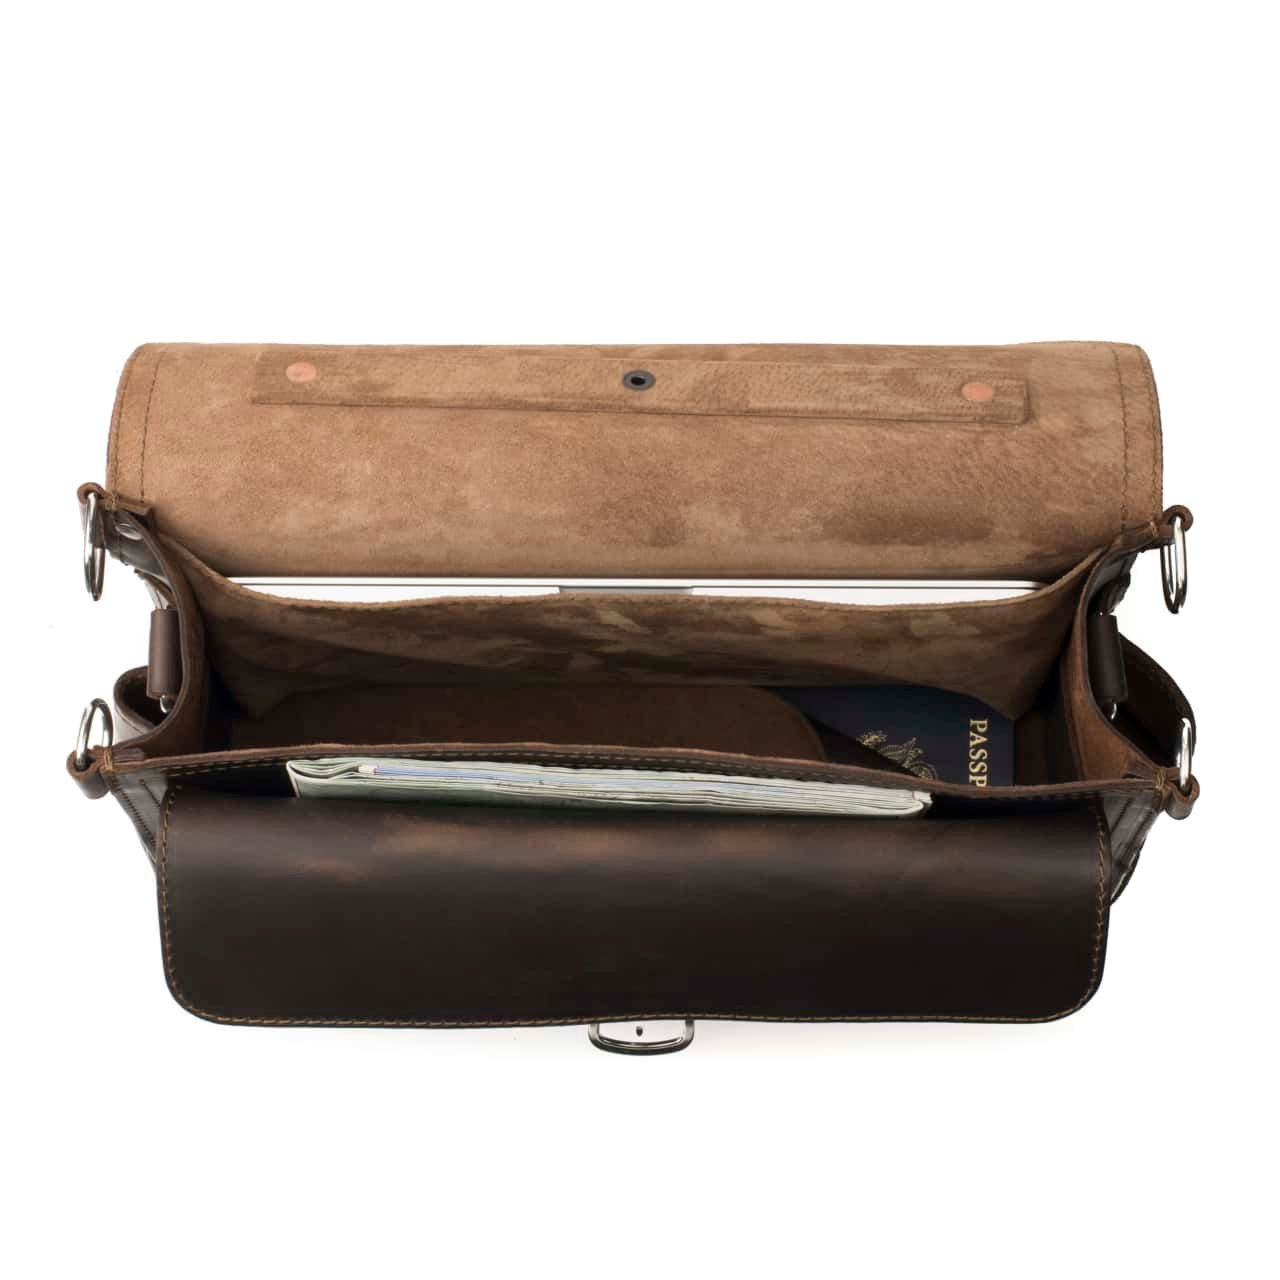 Saddleback Leather Co. Slim Full Grain Leather 15-inch Laptop Computer Bag Includes 100 Year Warranty by Saddleback Leather Co. (Image #3)